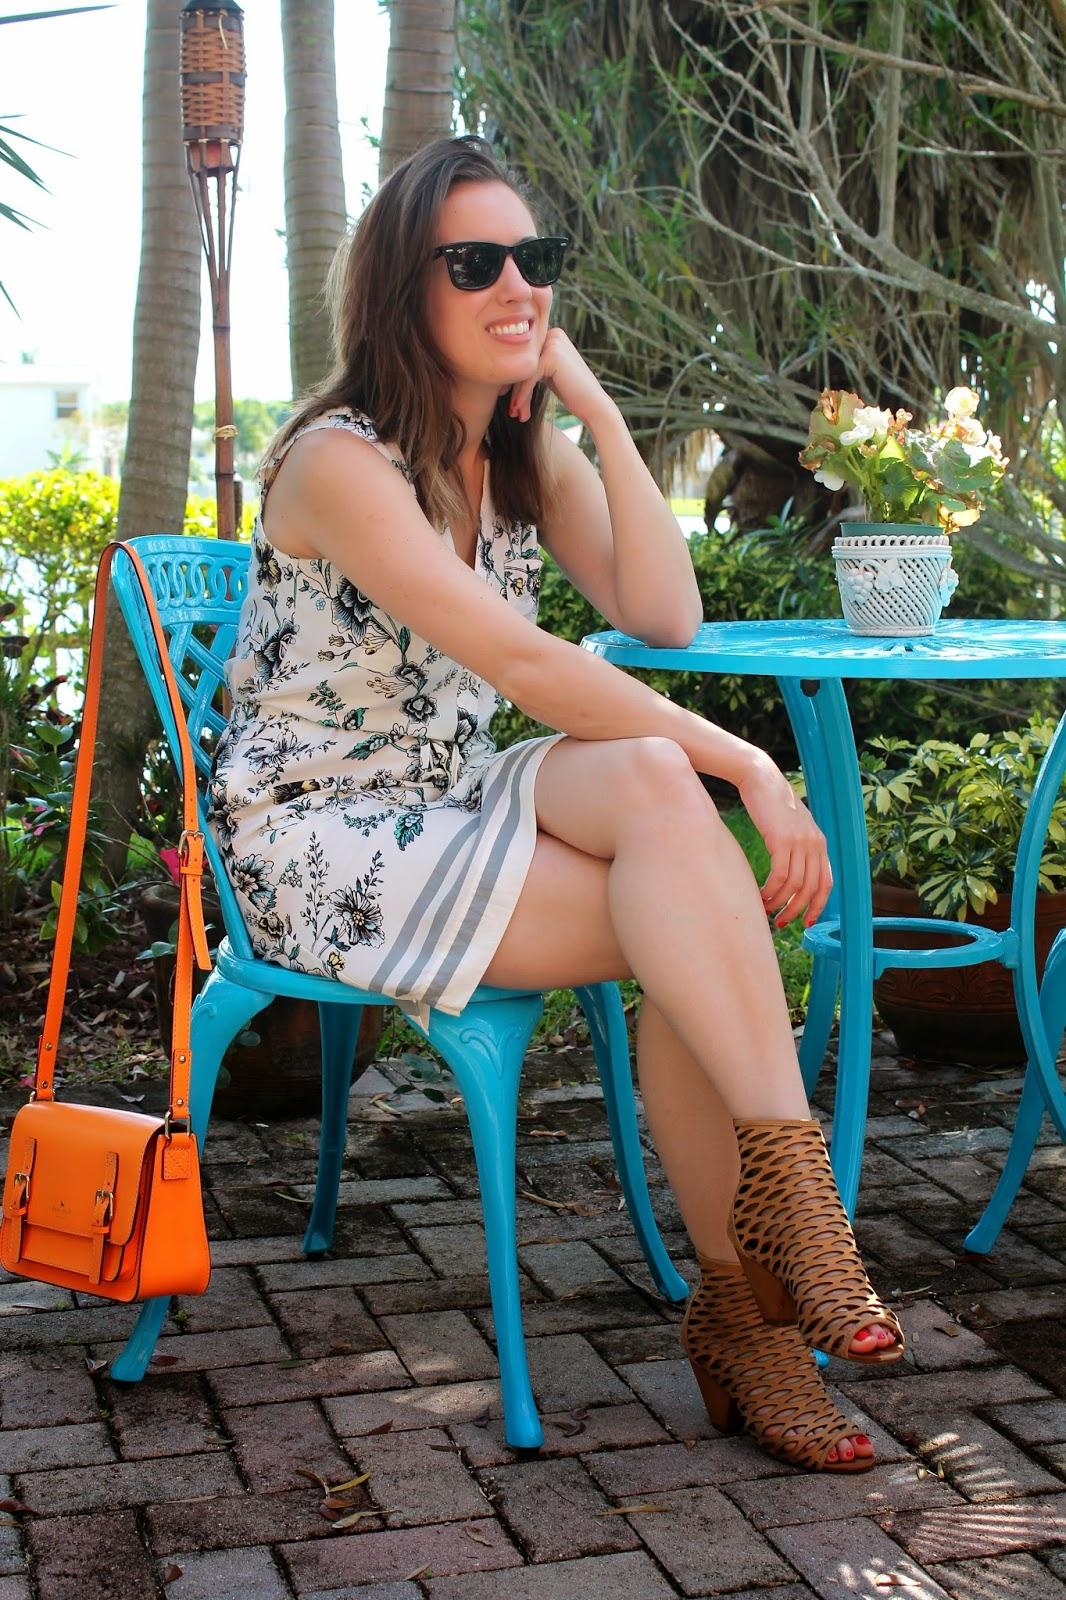 LOFT, jeffrey campbell, Kate Spade, Ray-Ban, fashion, style, fashion blog, style blog, look book, fashion blogger